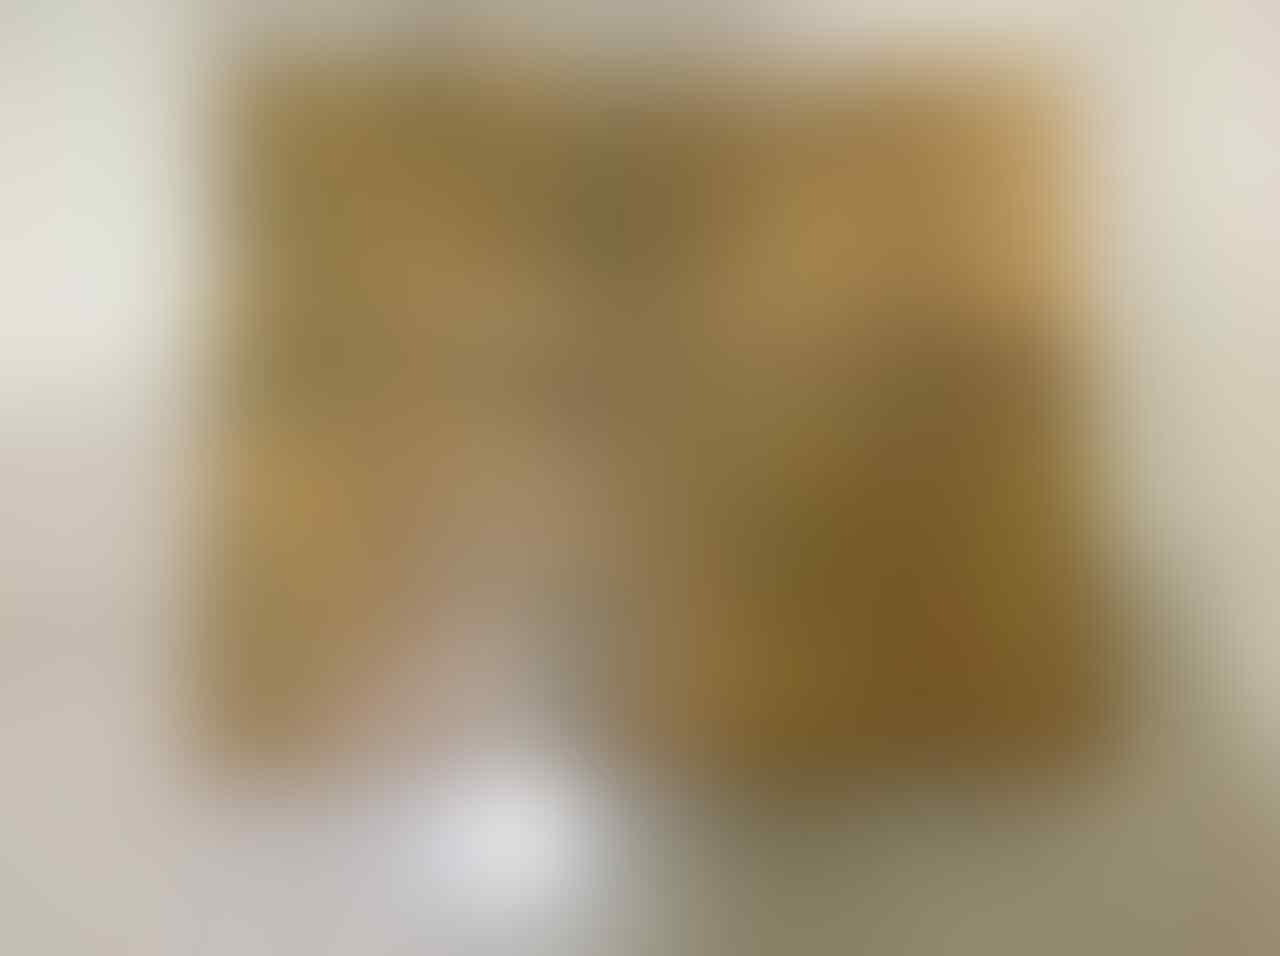 ▓█ Obeng T5 T6 SANFIX DEKKO CADIK Set 1006N TH303 Thermometer Hygrometer Indoor ▓█